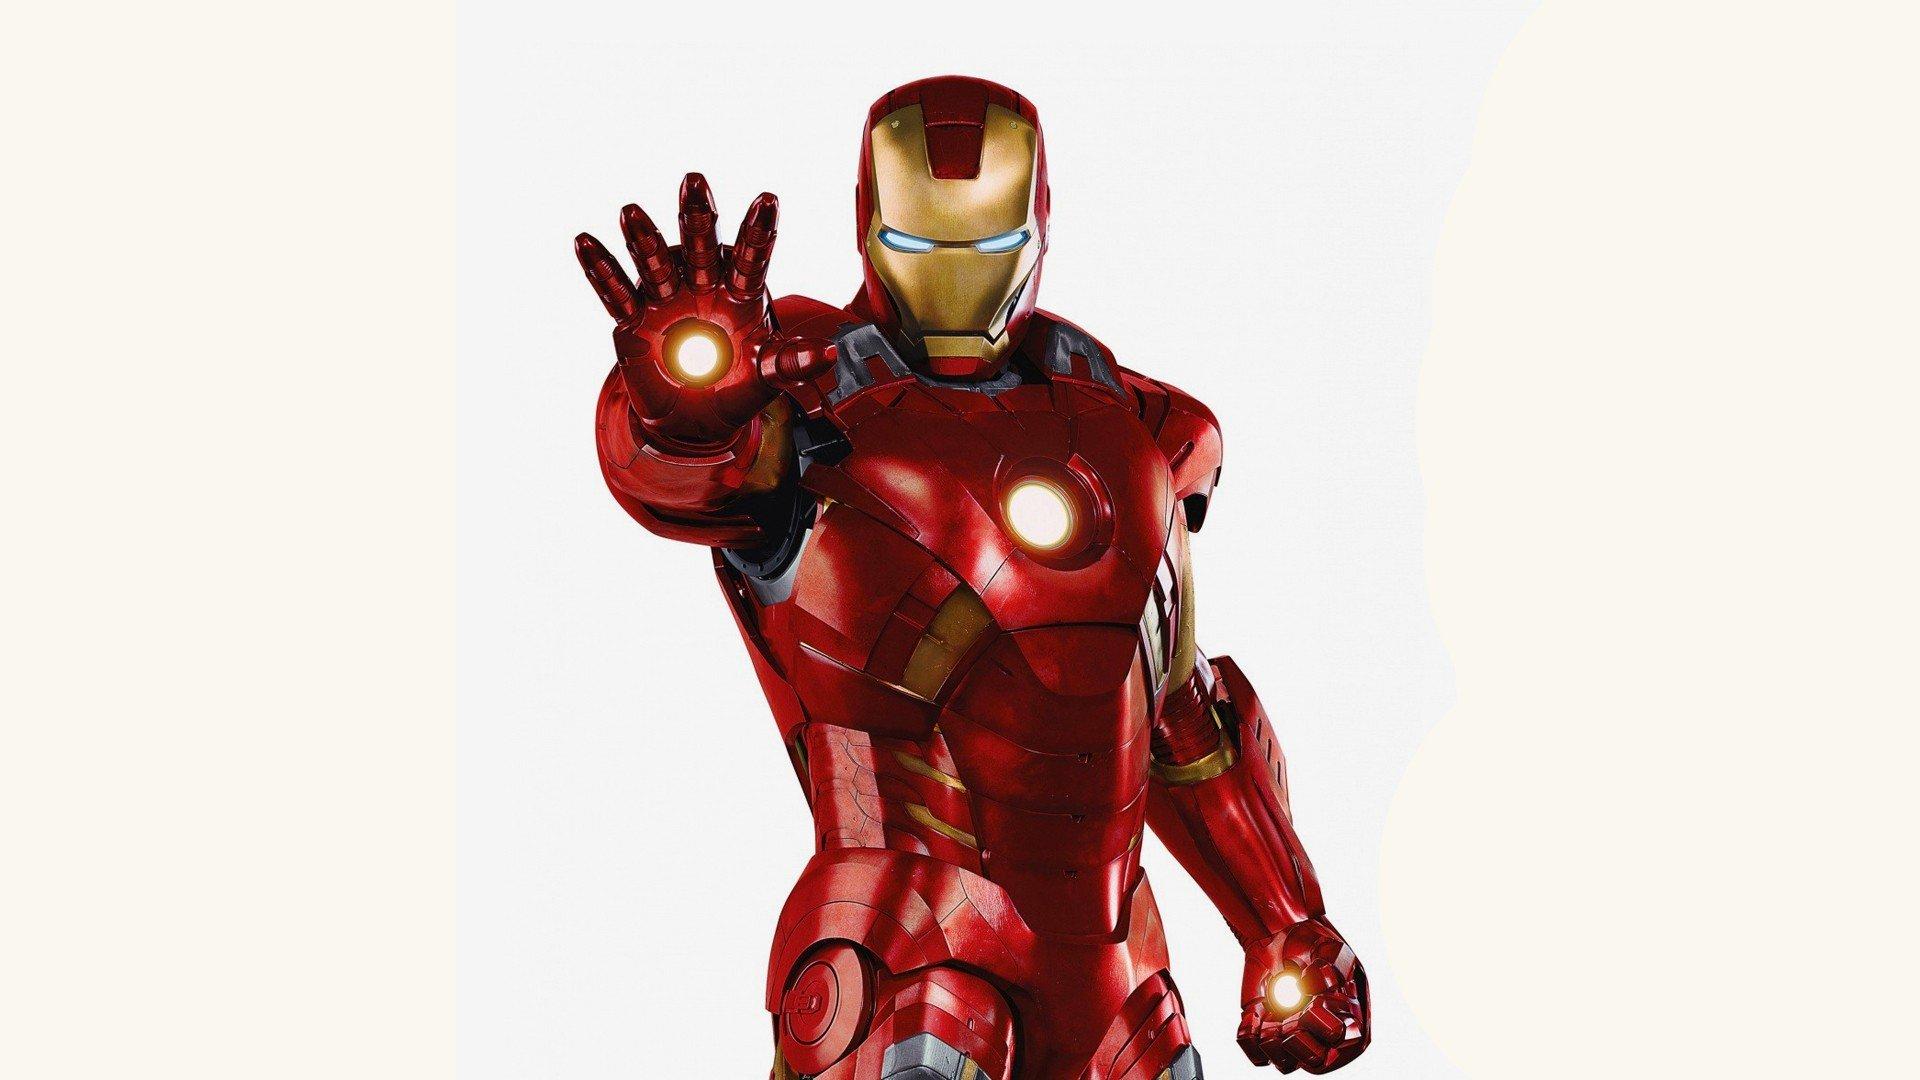 Iron Man Comic Wallpapers High Definition - Wickedsa com